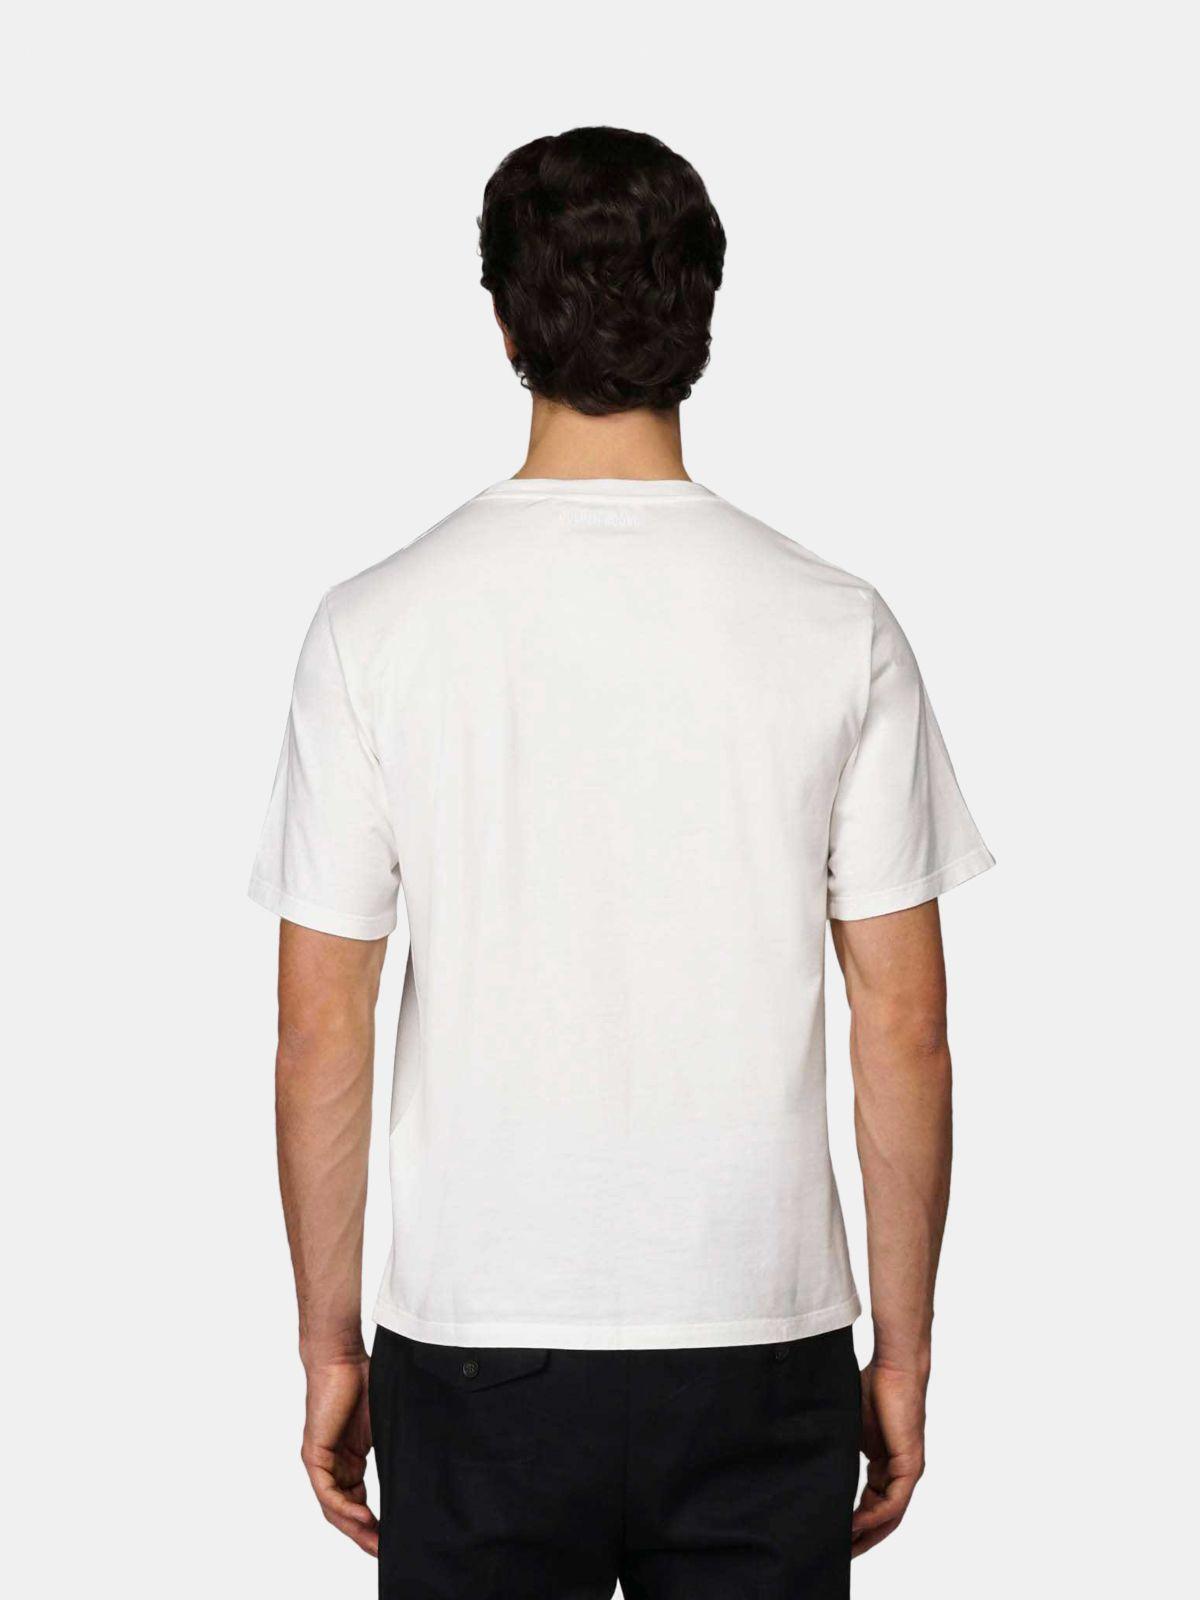 Golden Goose - T-shirt Golden blanc avec broderie «Love» in